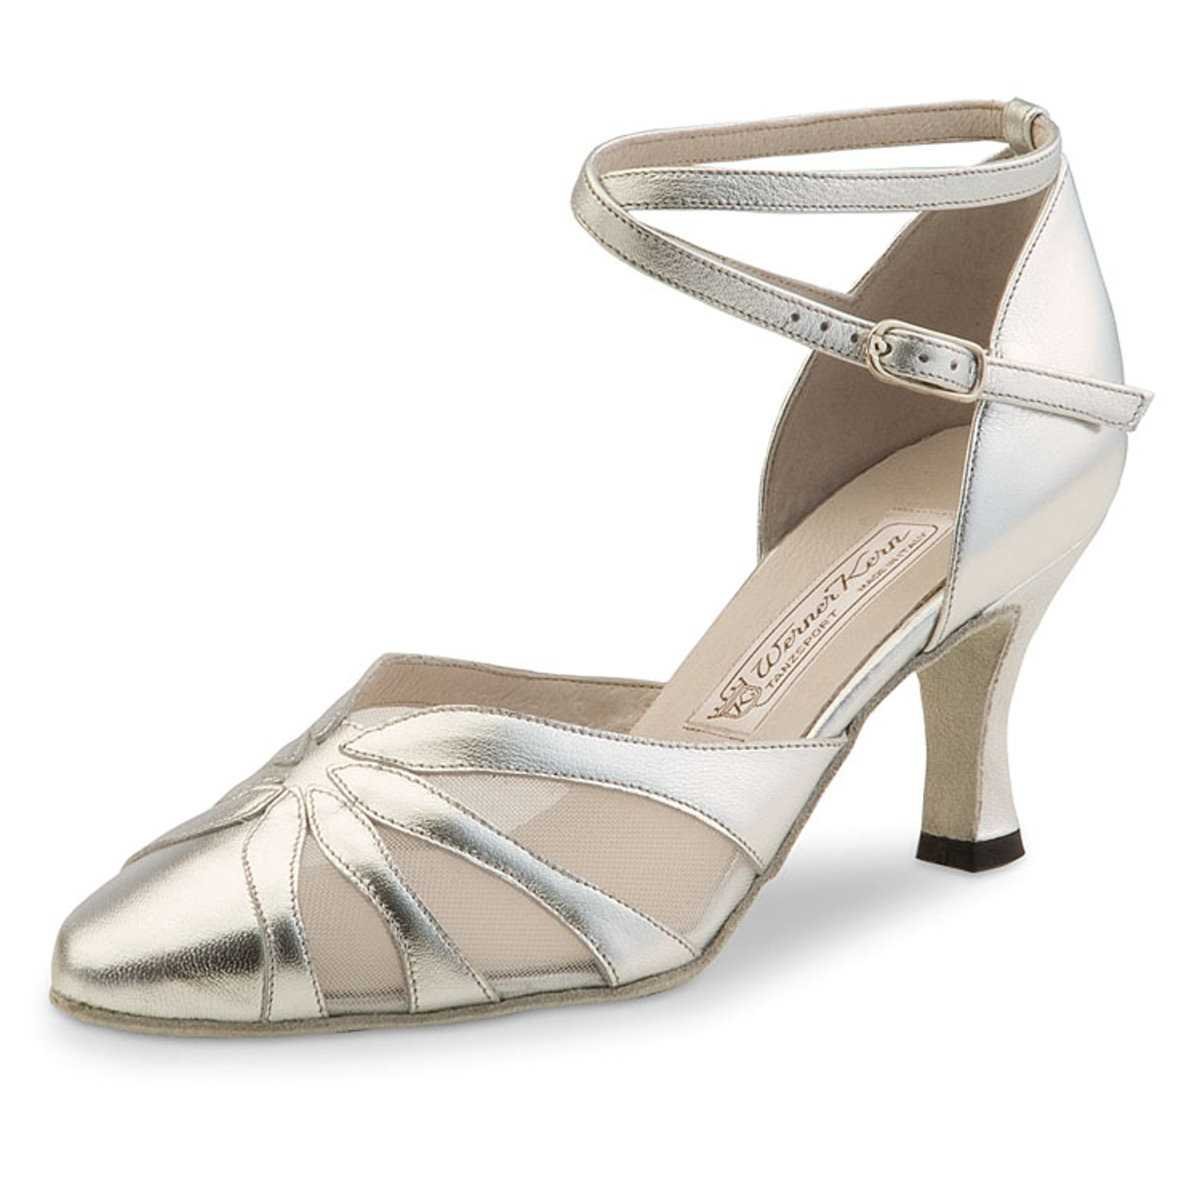 Werner Kern Femmes Chaussures de Danse Linda - Chevro Argent - 6, 5 cm Daniela 3 4